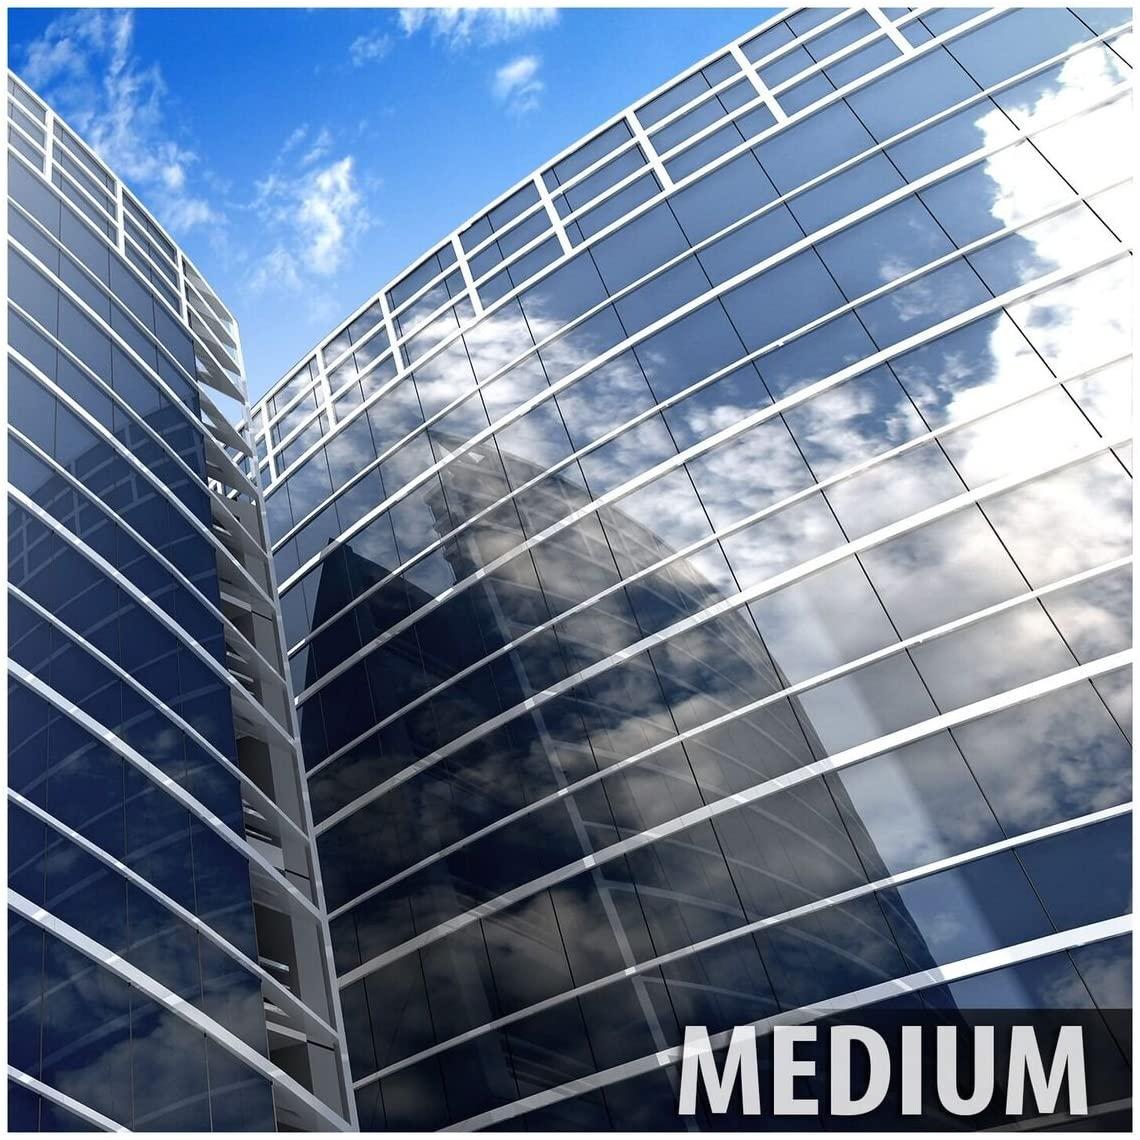 BDF S35 Window Film High Heat Rejection Reflective Silver 35 (Medium) - 48in X 24ft